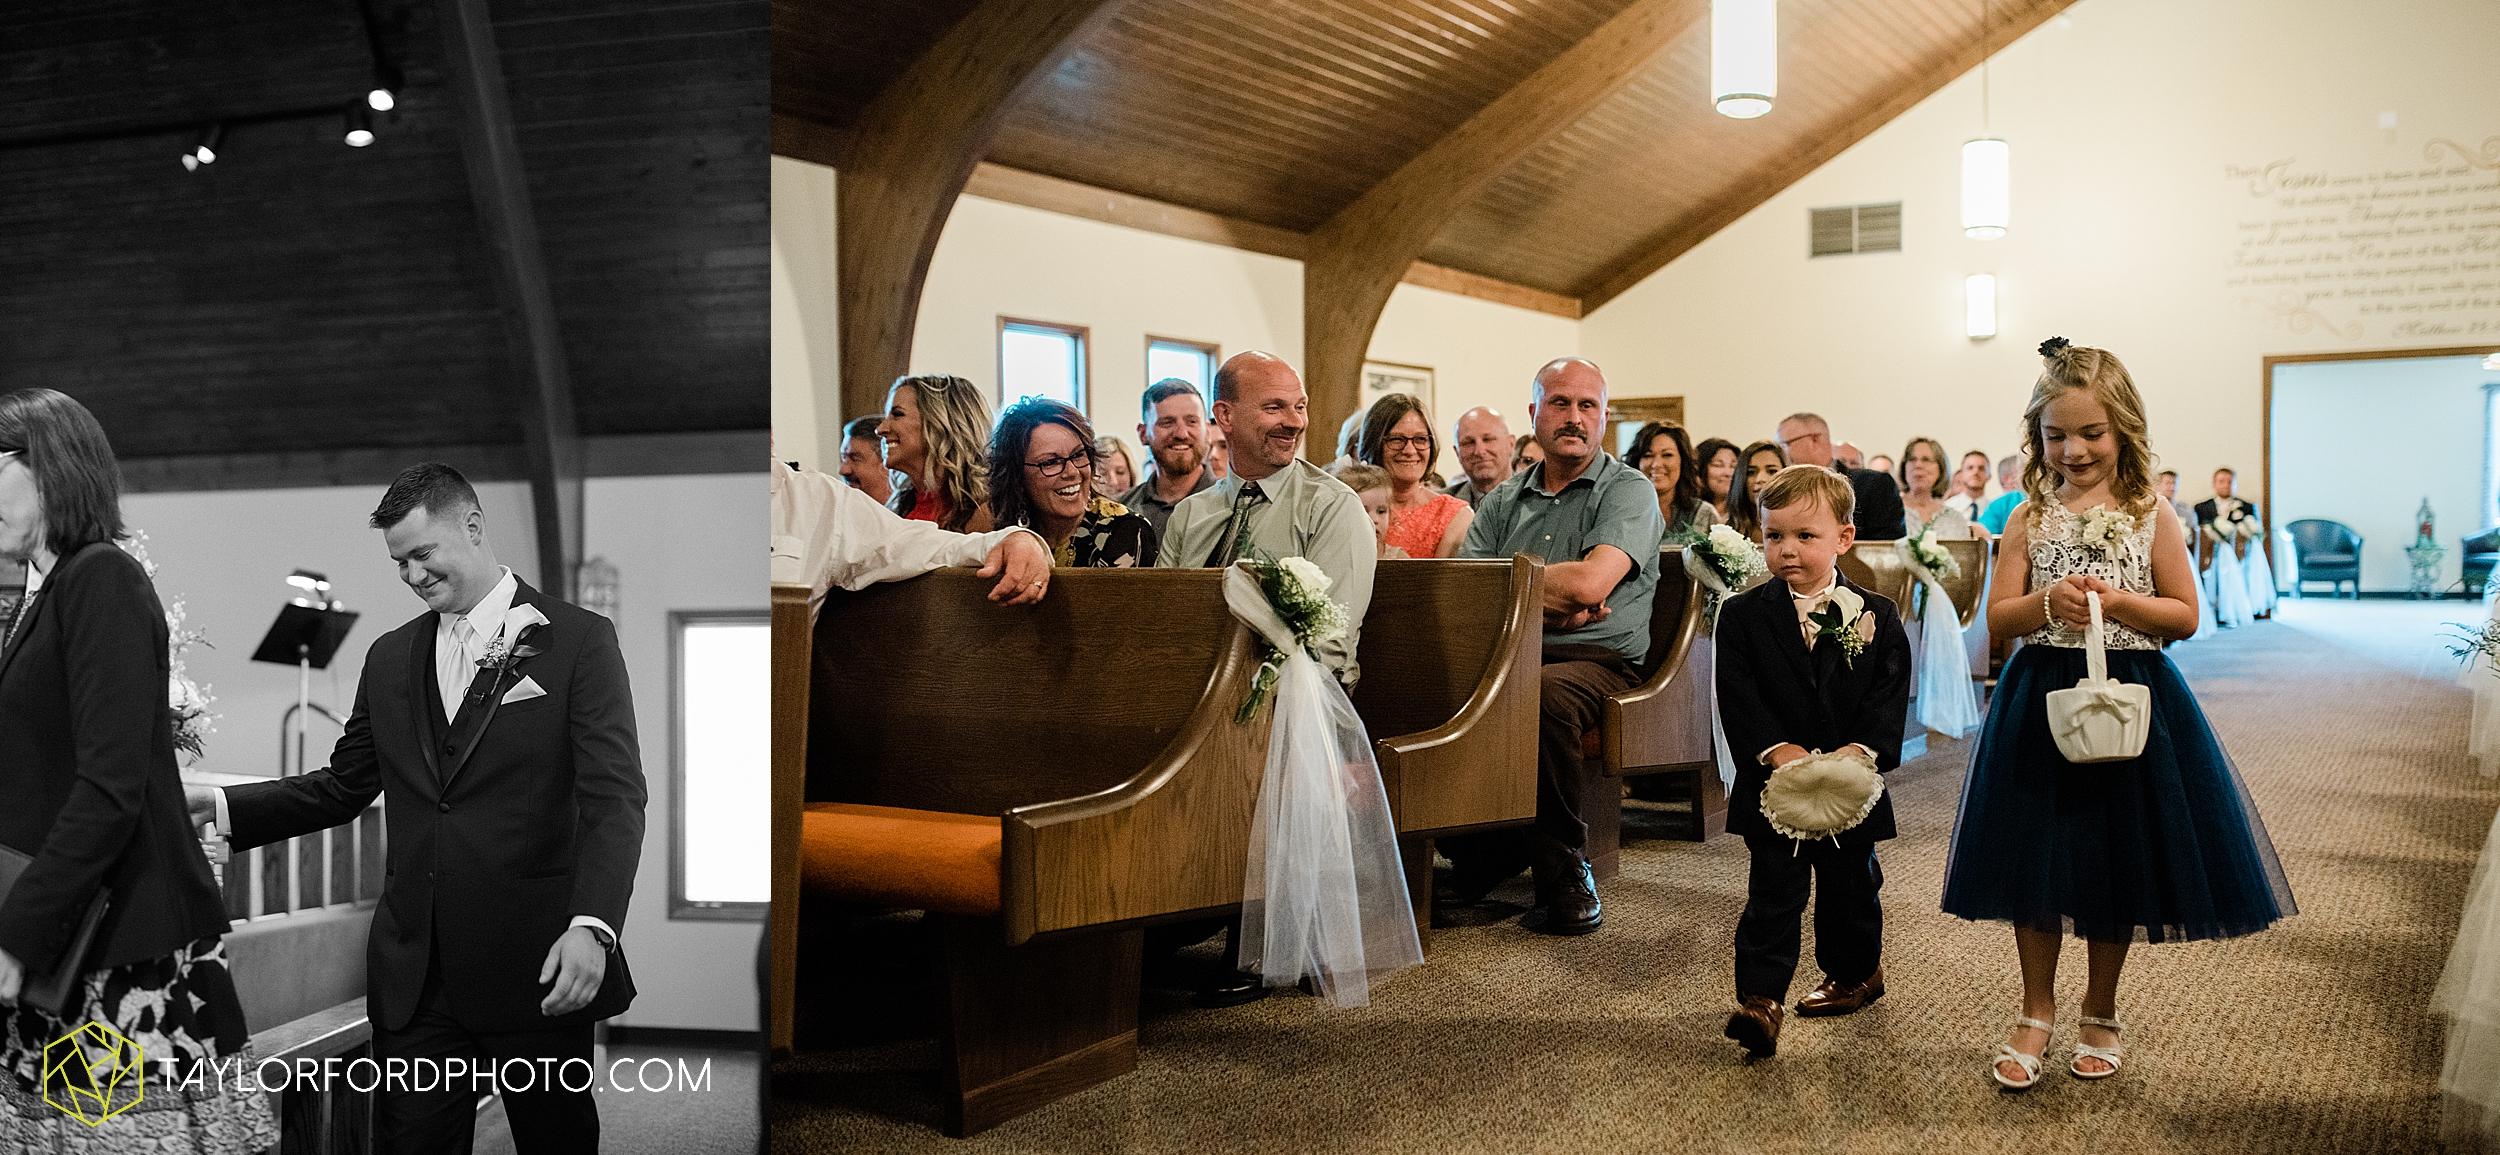 carly-trent-lima-elida-ohio-wedding-the-met-civic-center-reception-immanuel-united-methodist-church-photography-taylor-ford-hirschy-photographer_3344.jpg